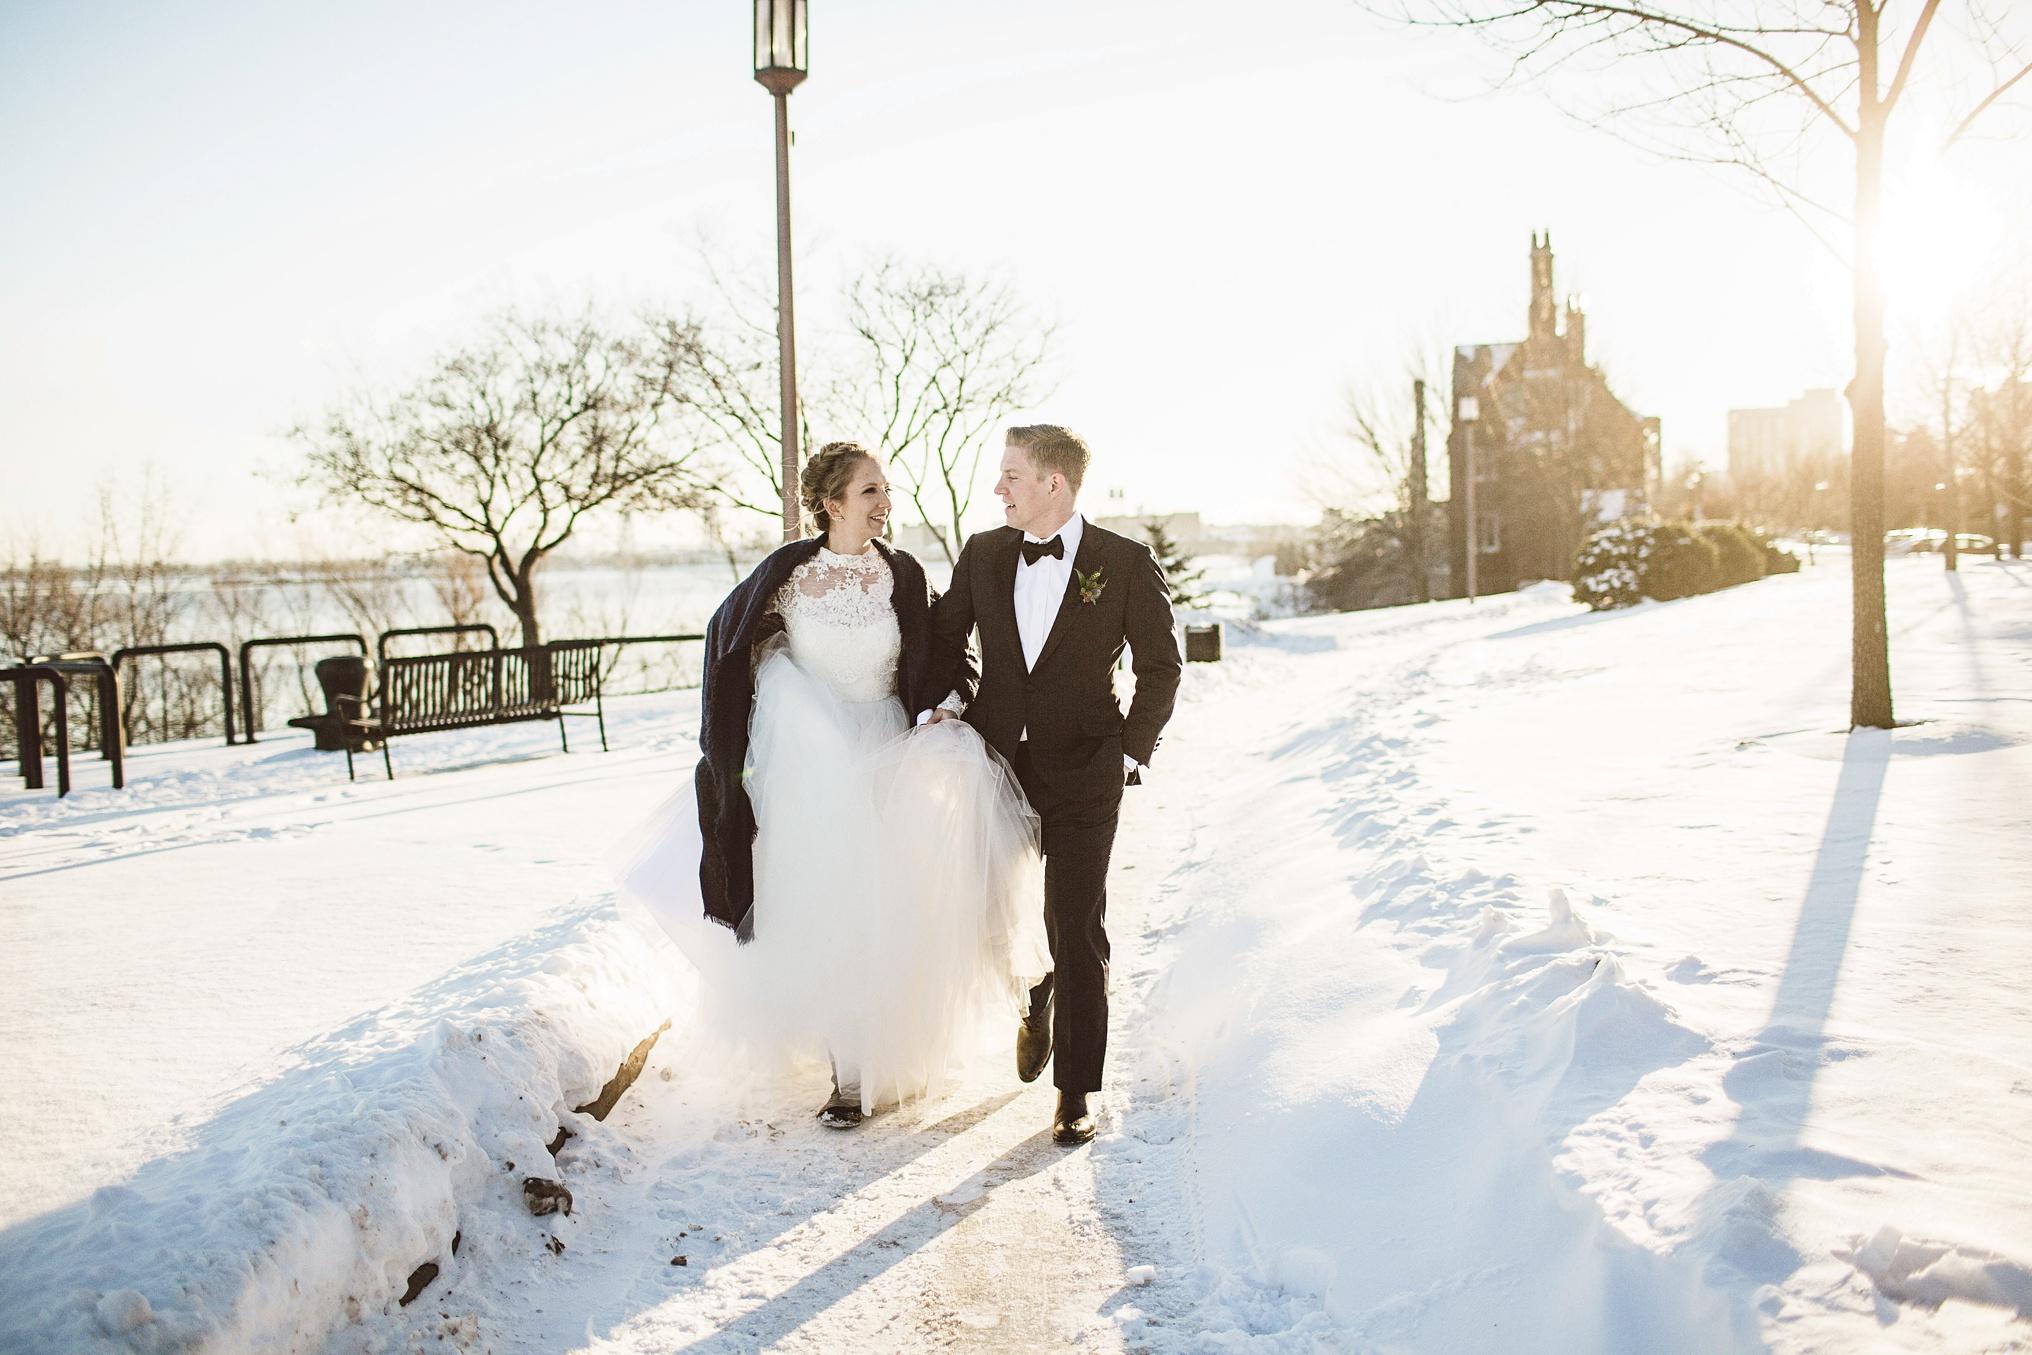 best_wedding_photography_2017_by_lucas_botz_photography_241.jpg